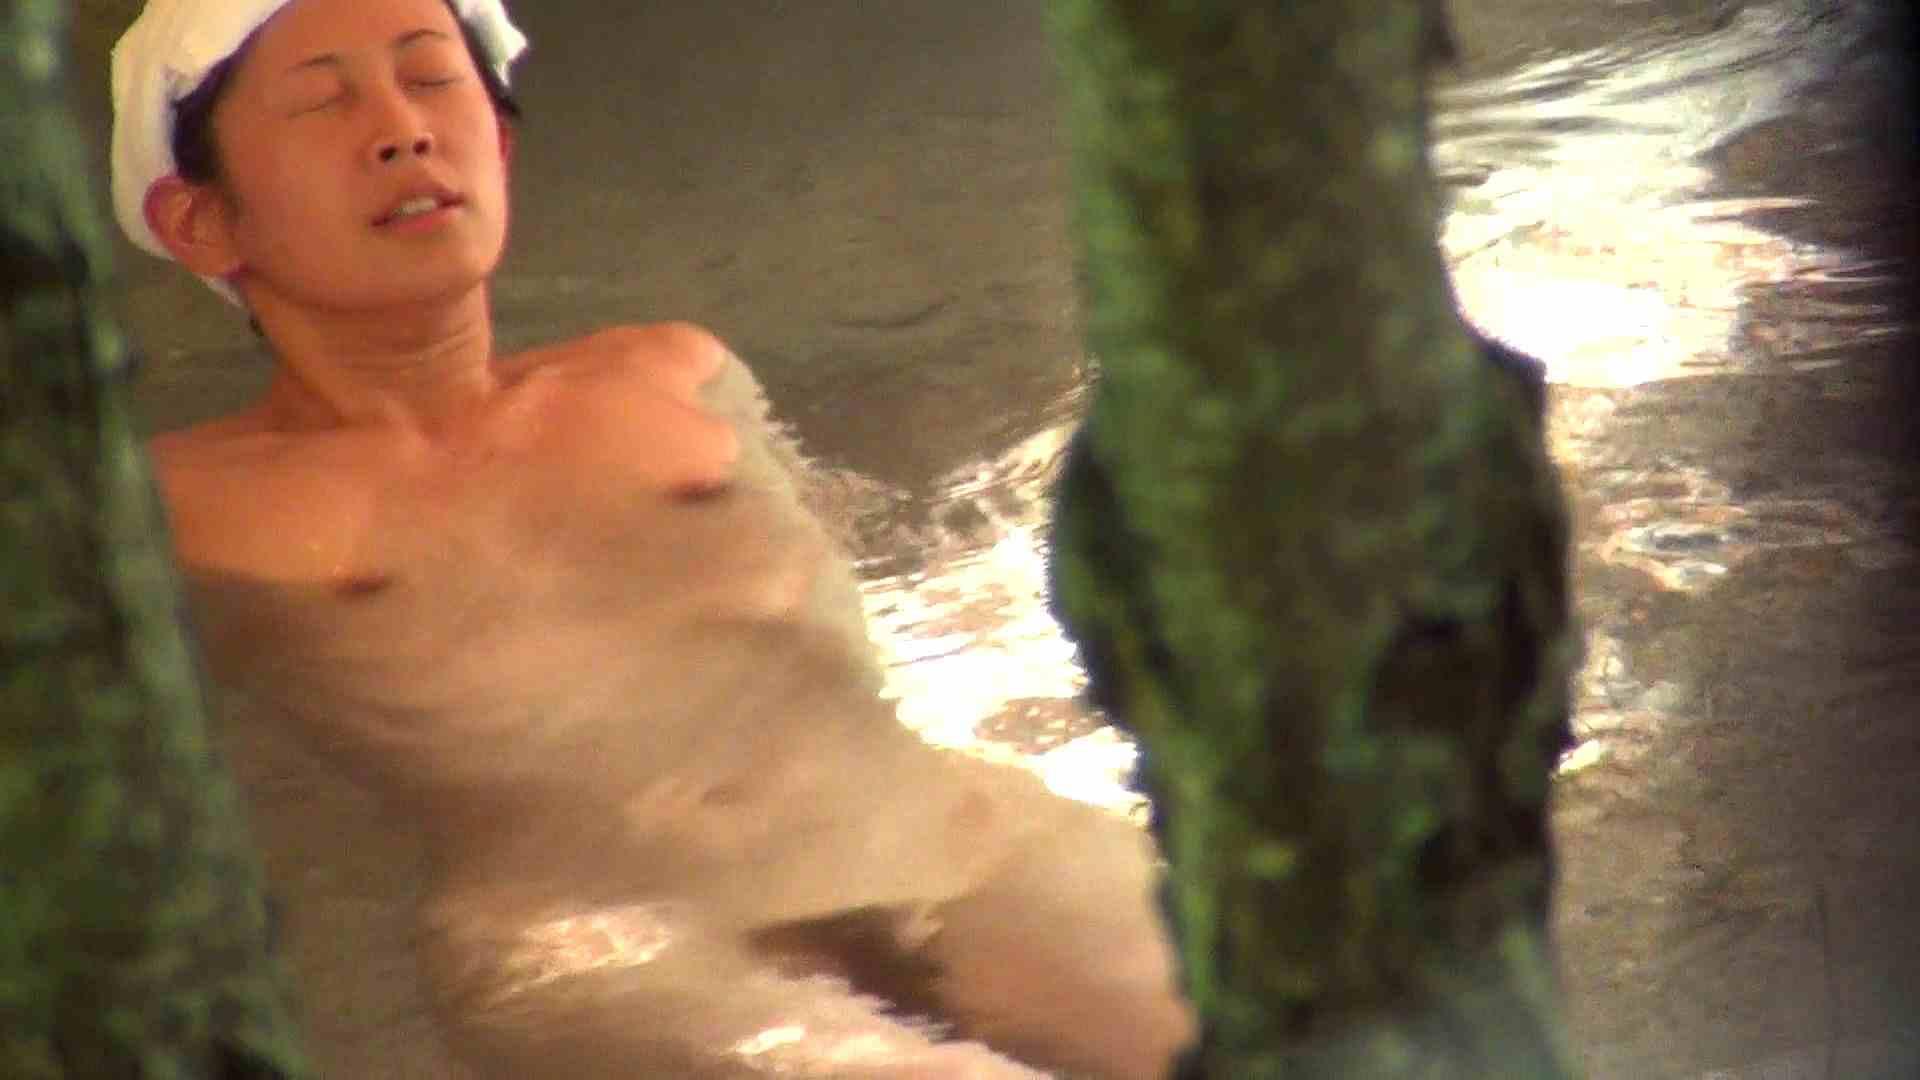 Vol.51 醤油j顔のお女市さん 胸の割りに下半身はがっちりタイプ 露天丸見え  79画像 75